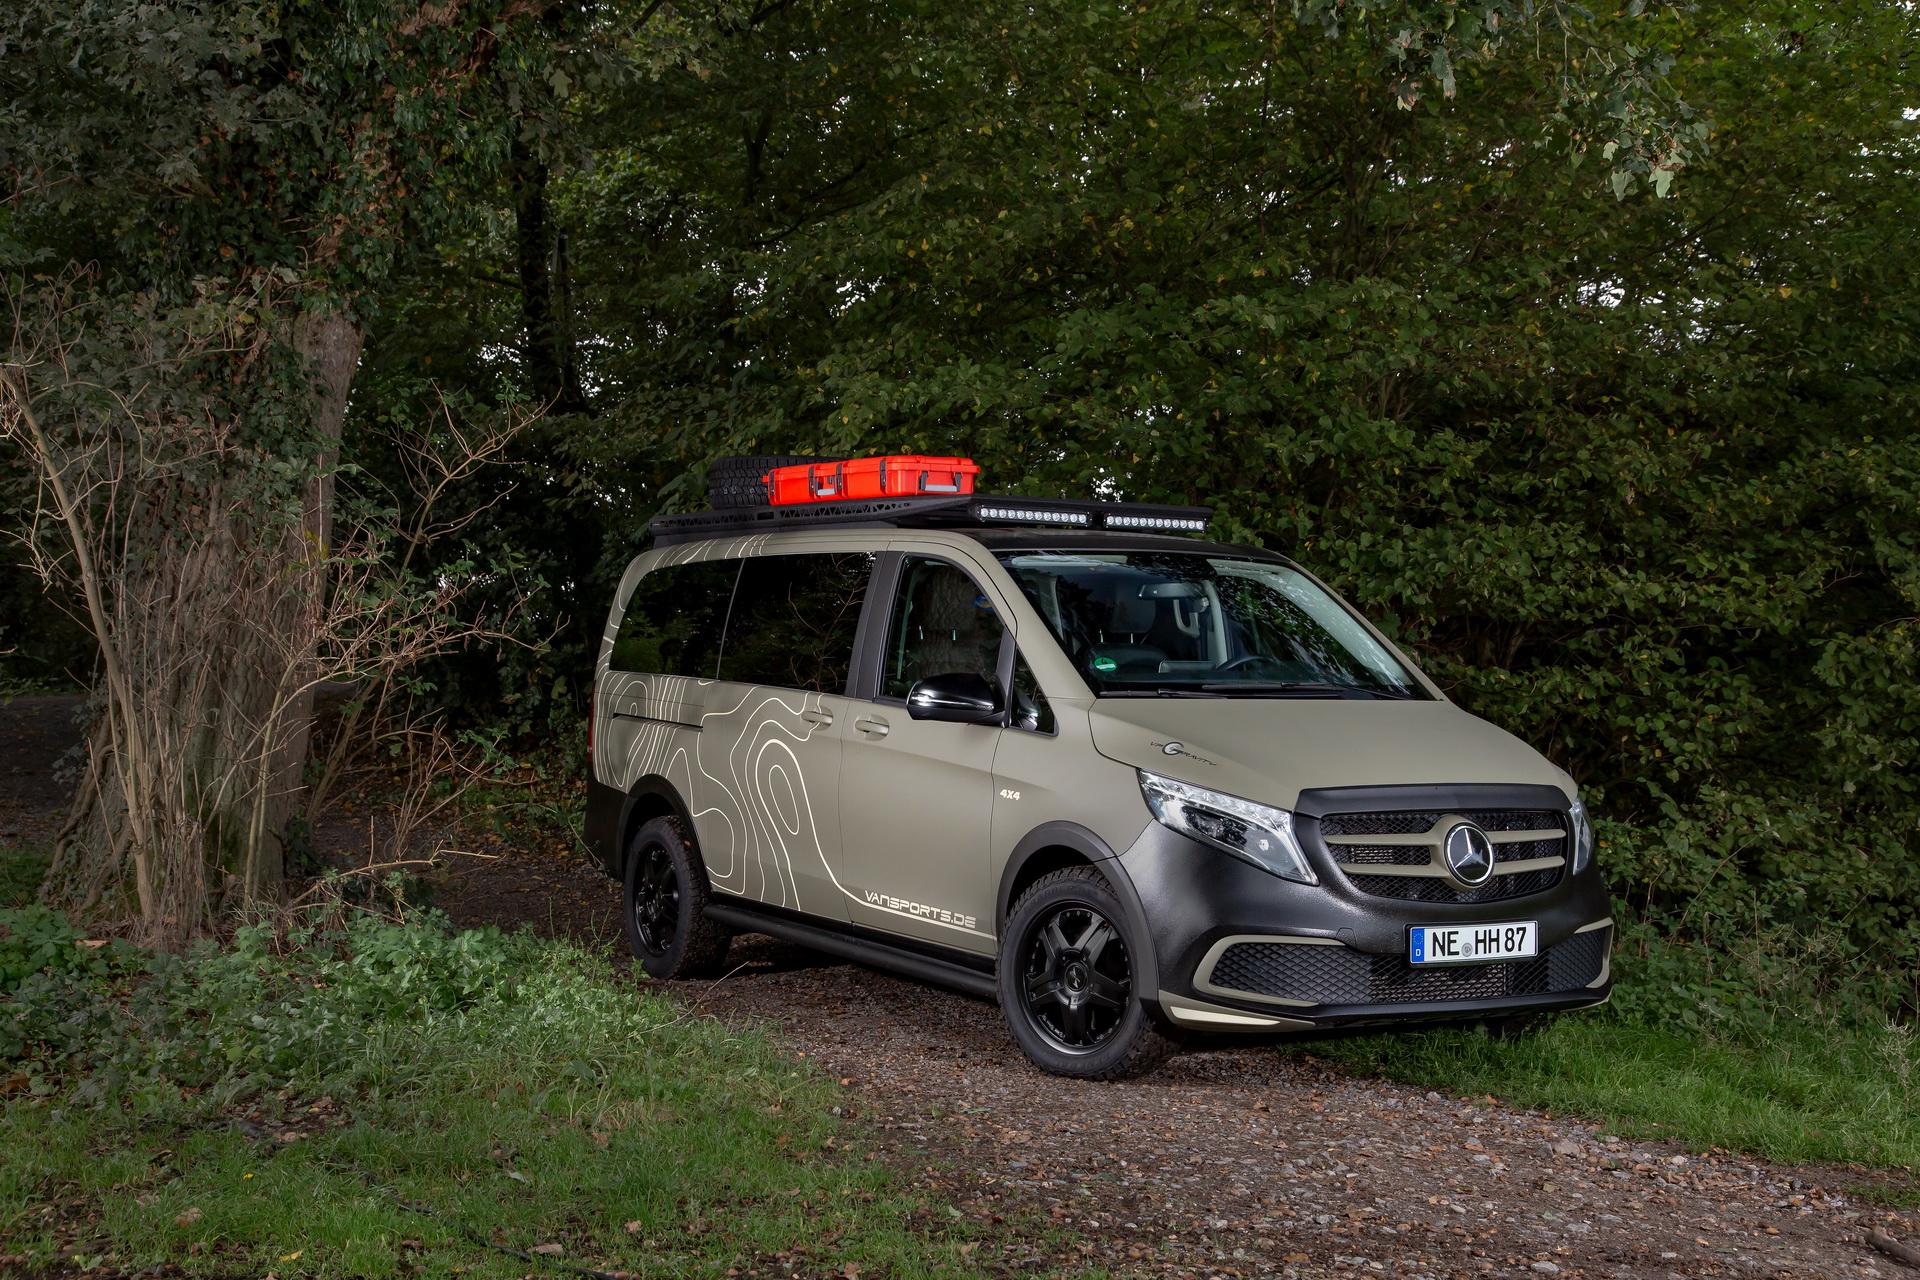 Escape the Urban Jungle with Hartmann's Mercedes-Benz V-Class GeoTrek